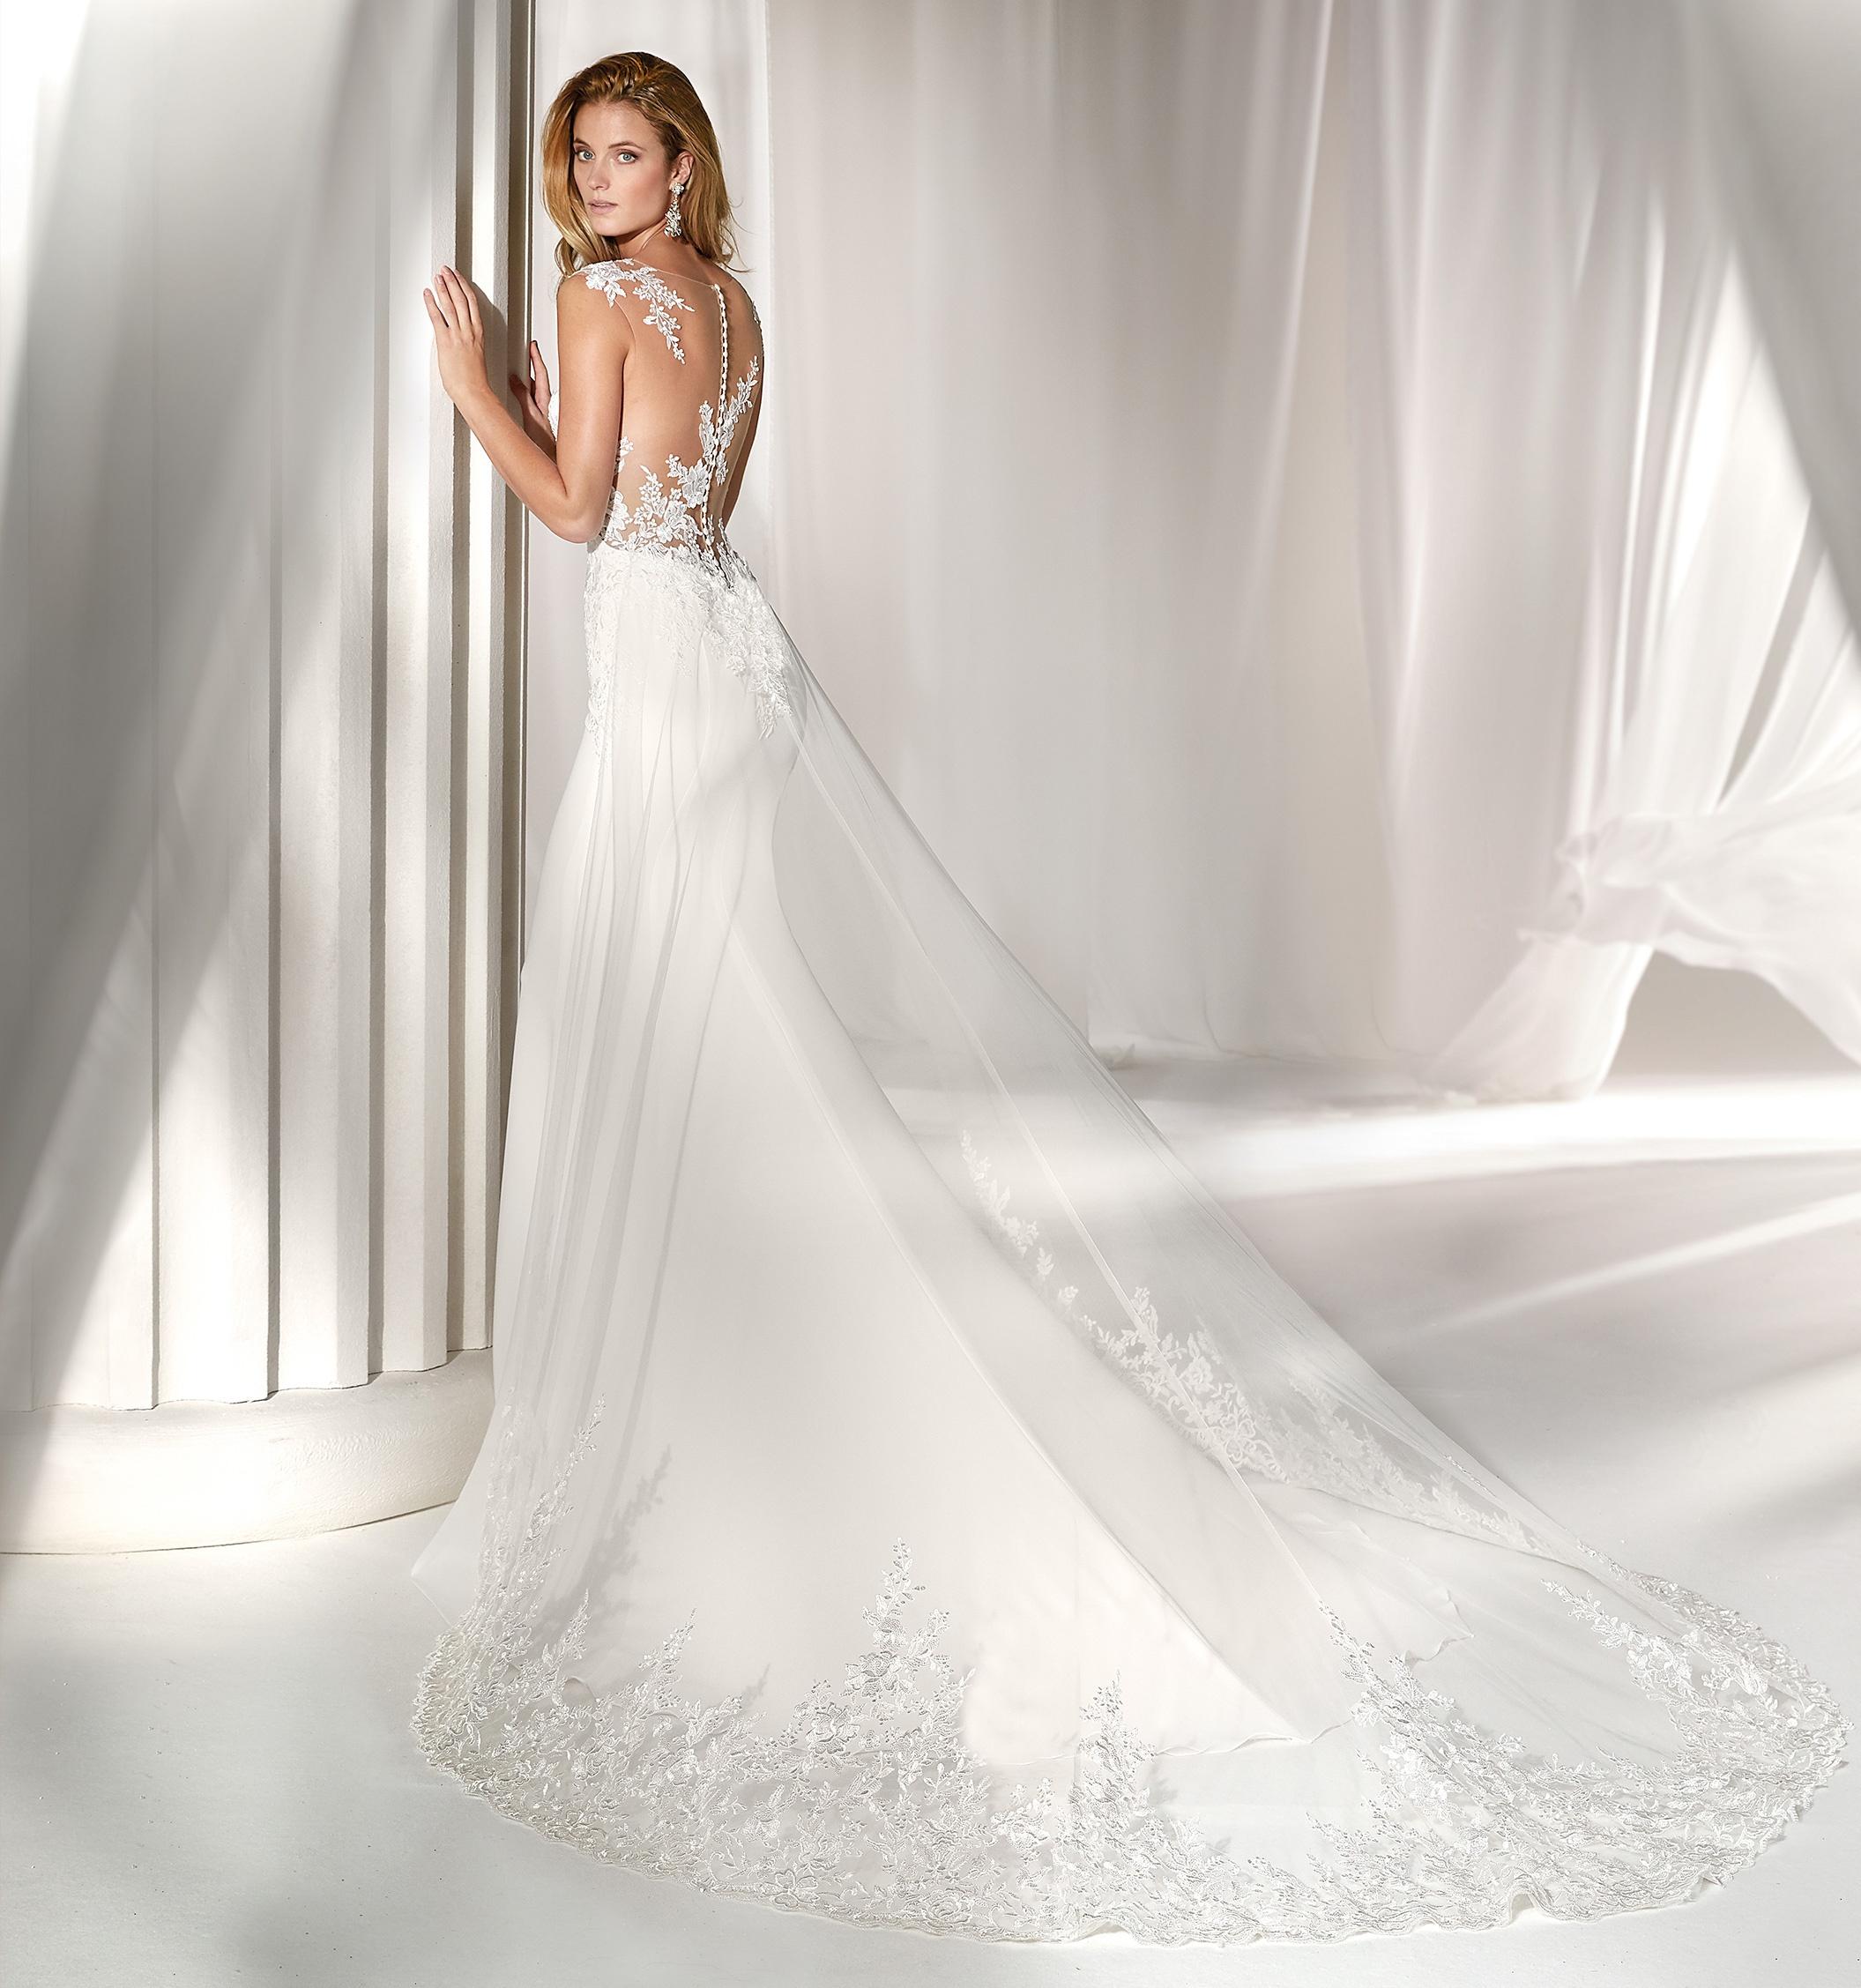 nicole-spose-NIAB19143-Nicole-moda-sposa-2019-370.jpg